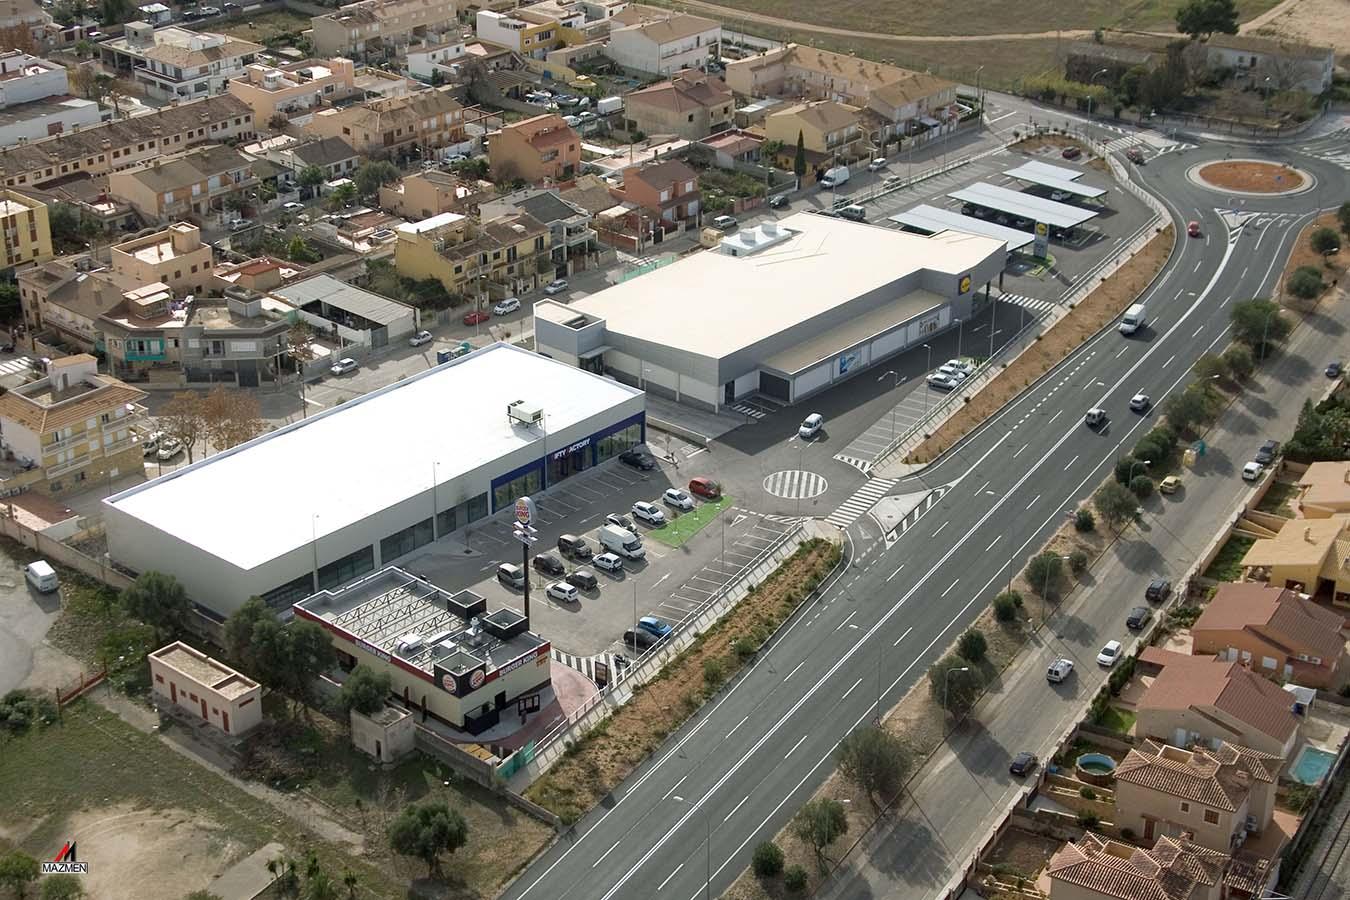 Centro Comercial Marratxi